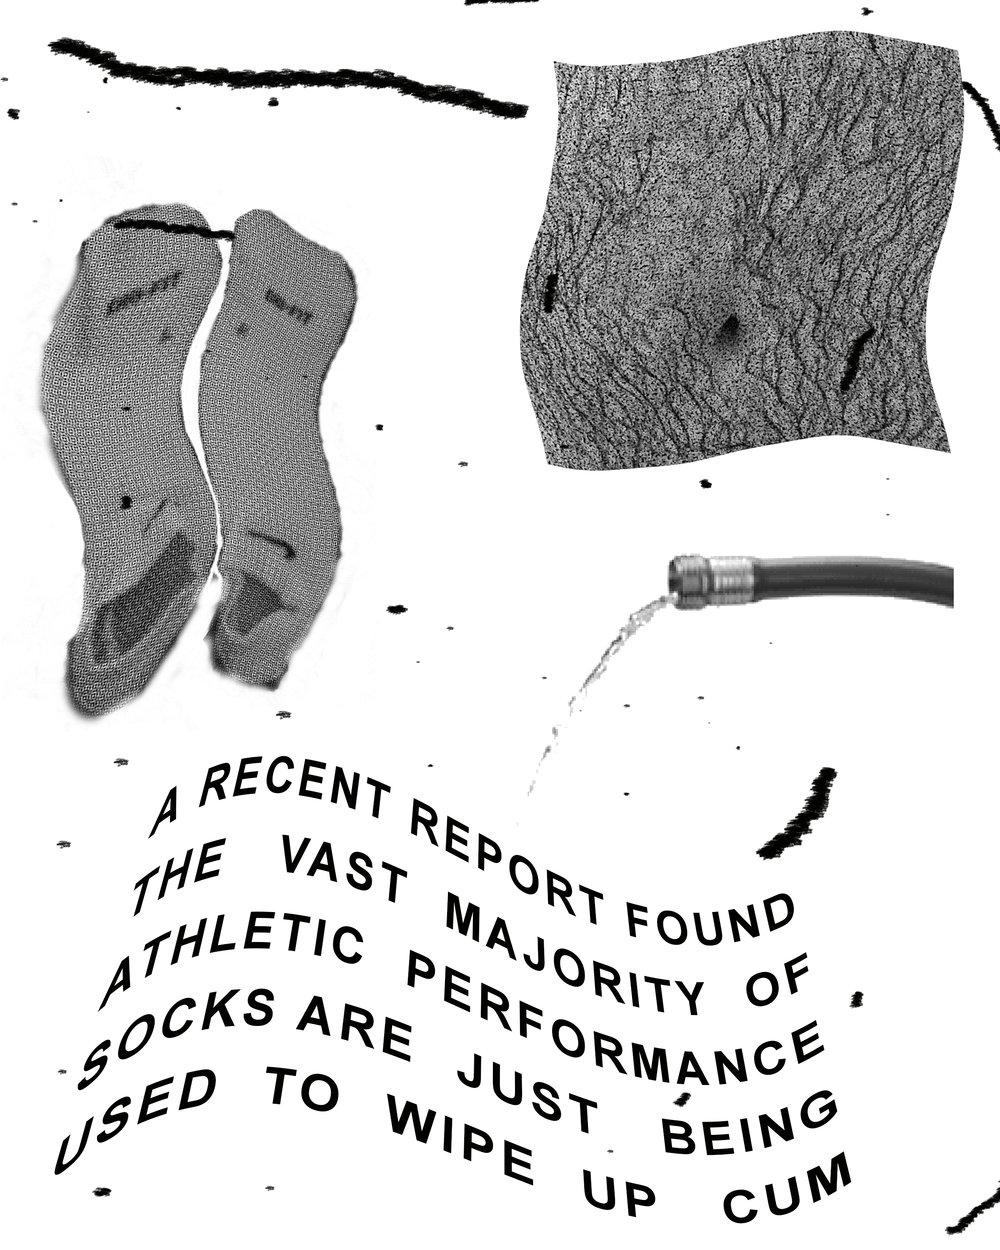 socks and sports proper.jpg